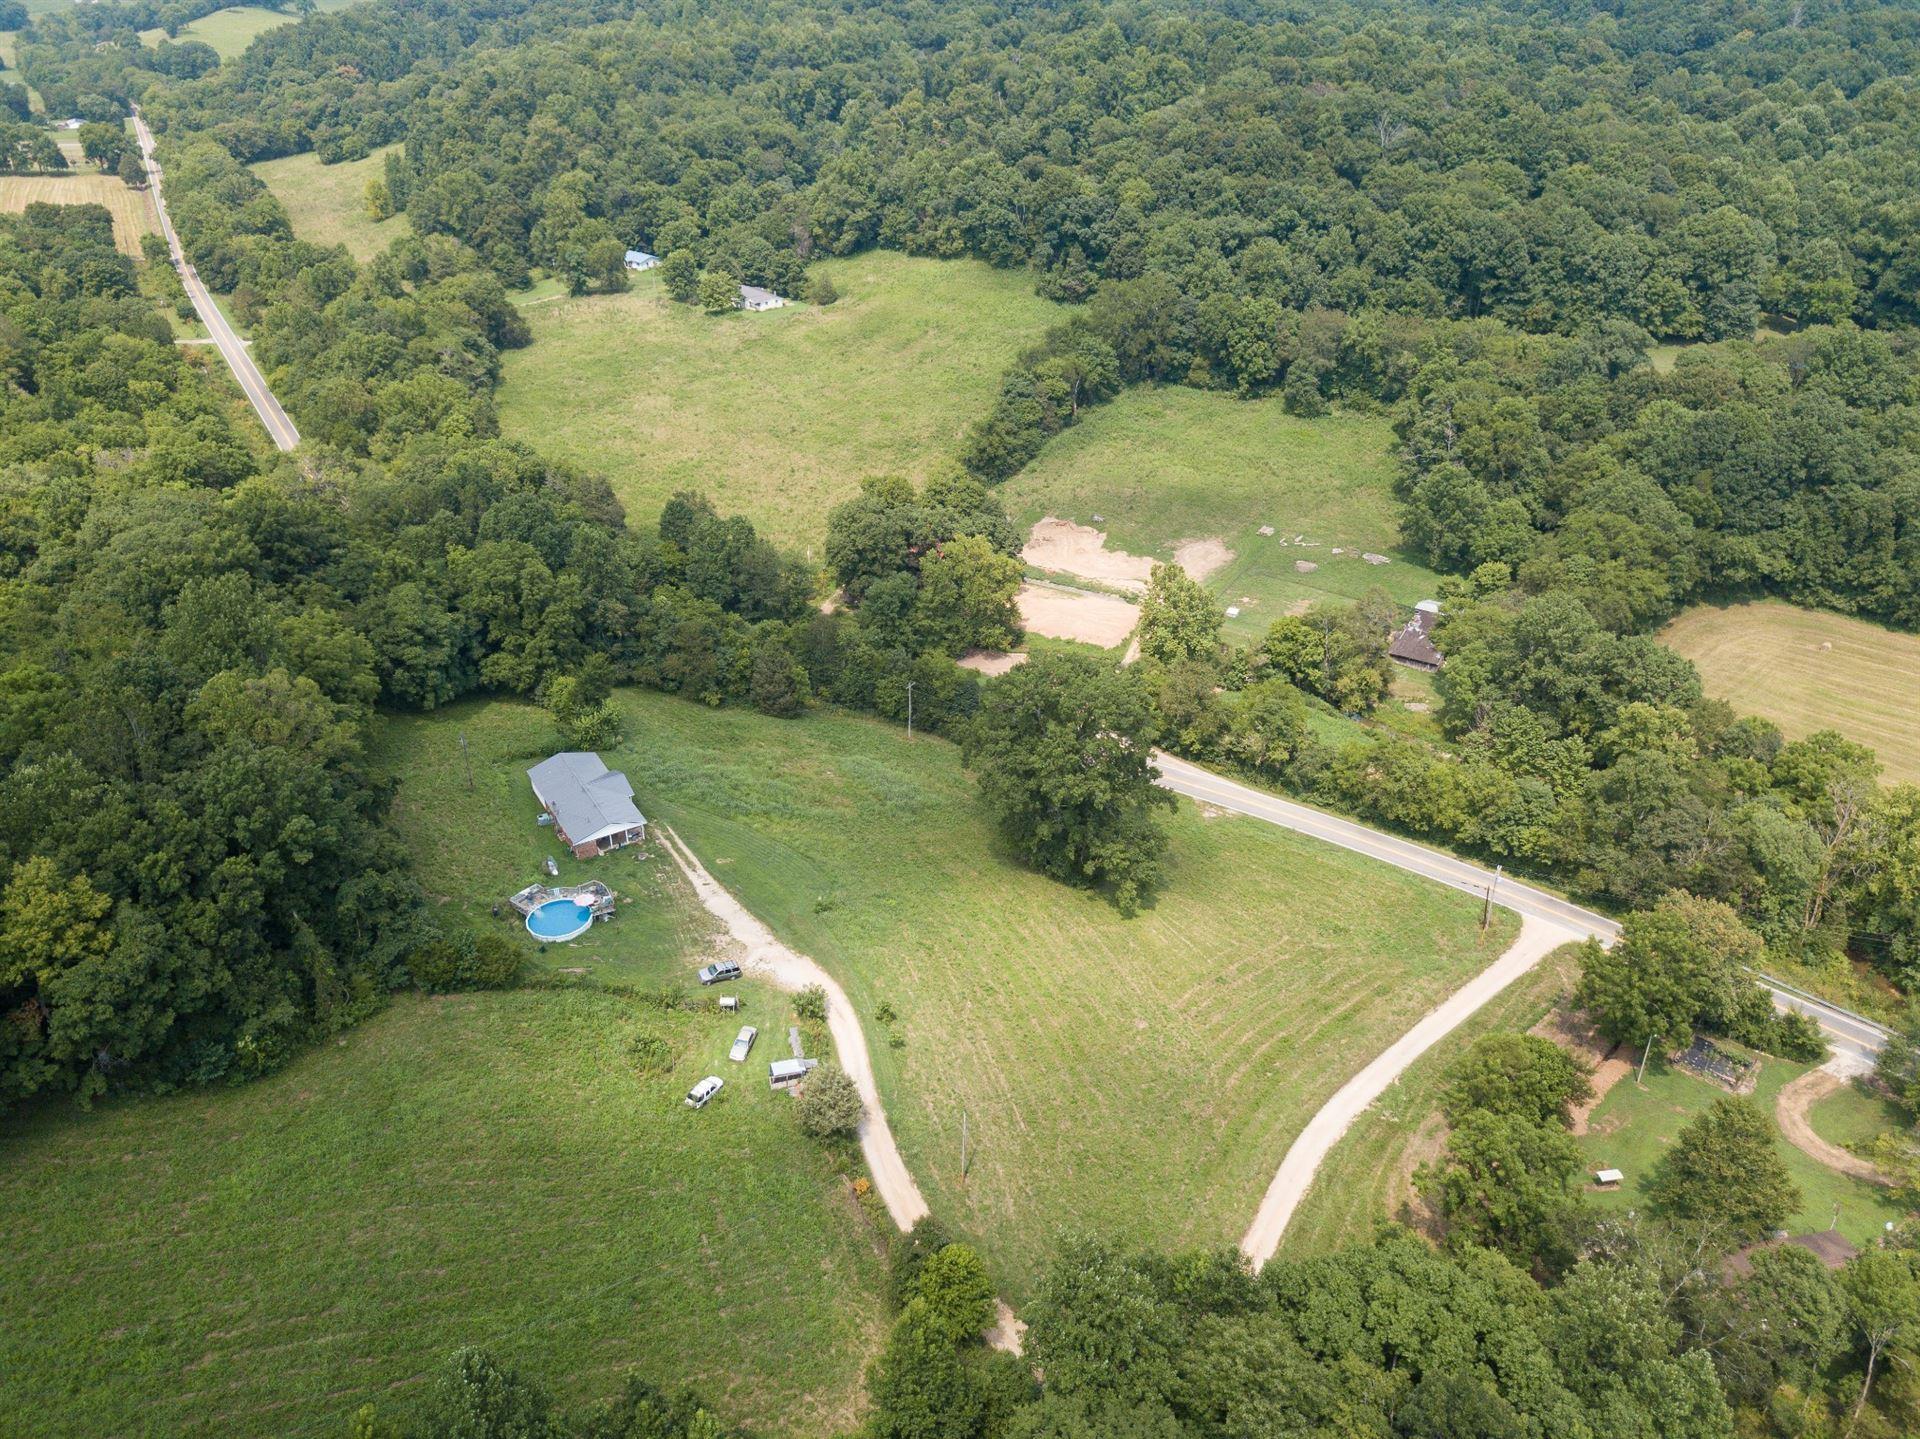 Photo of 9812 Primm Springs Rd, Williamsport, TN 38487 (MLS # 2295231)